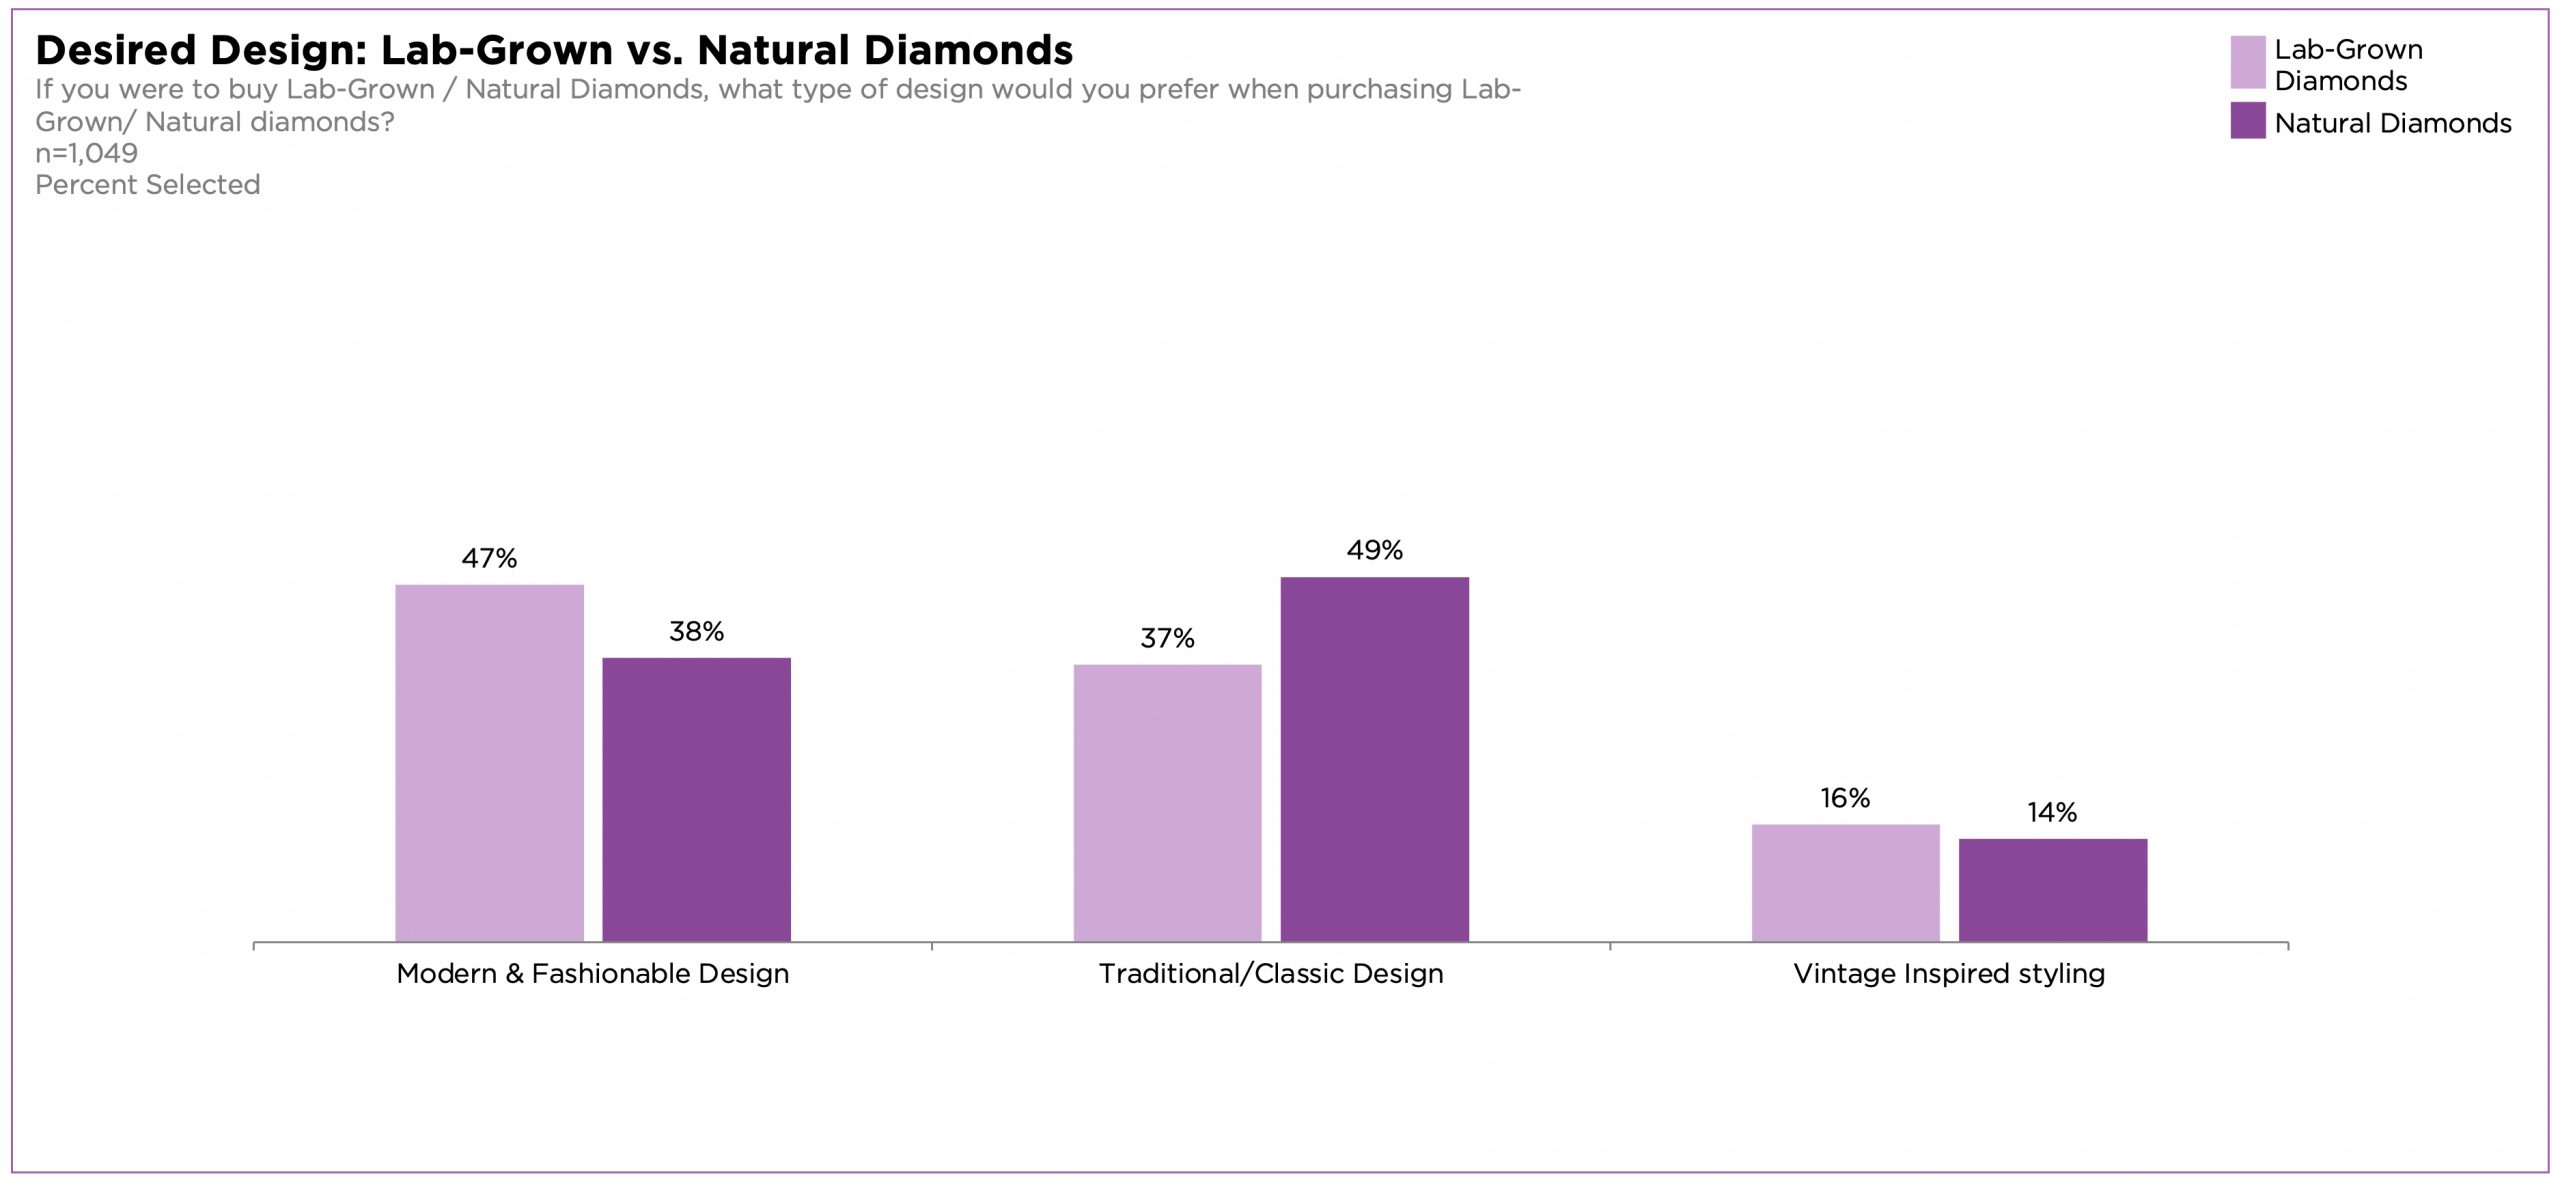 Landmark Study Identifies Consumer Understanding and Preferences for Lab-Grown Diamonds